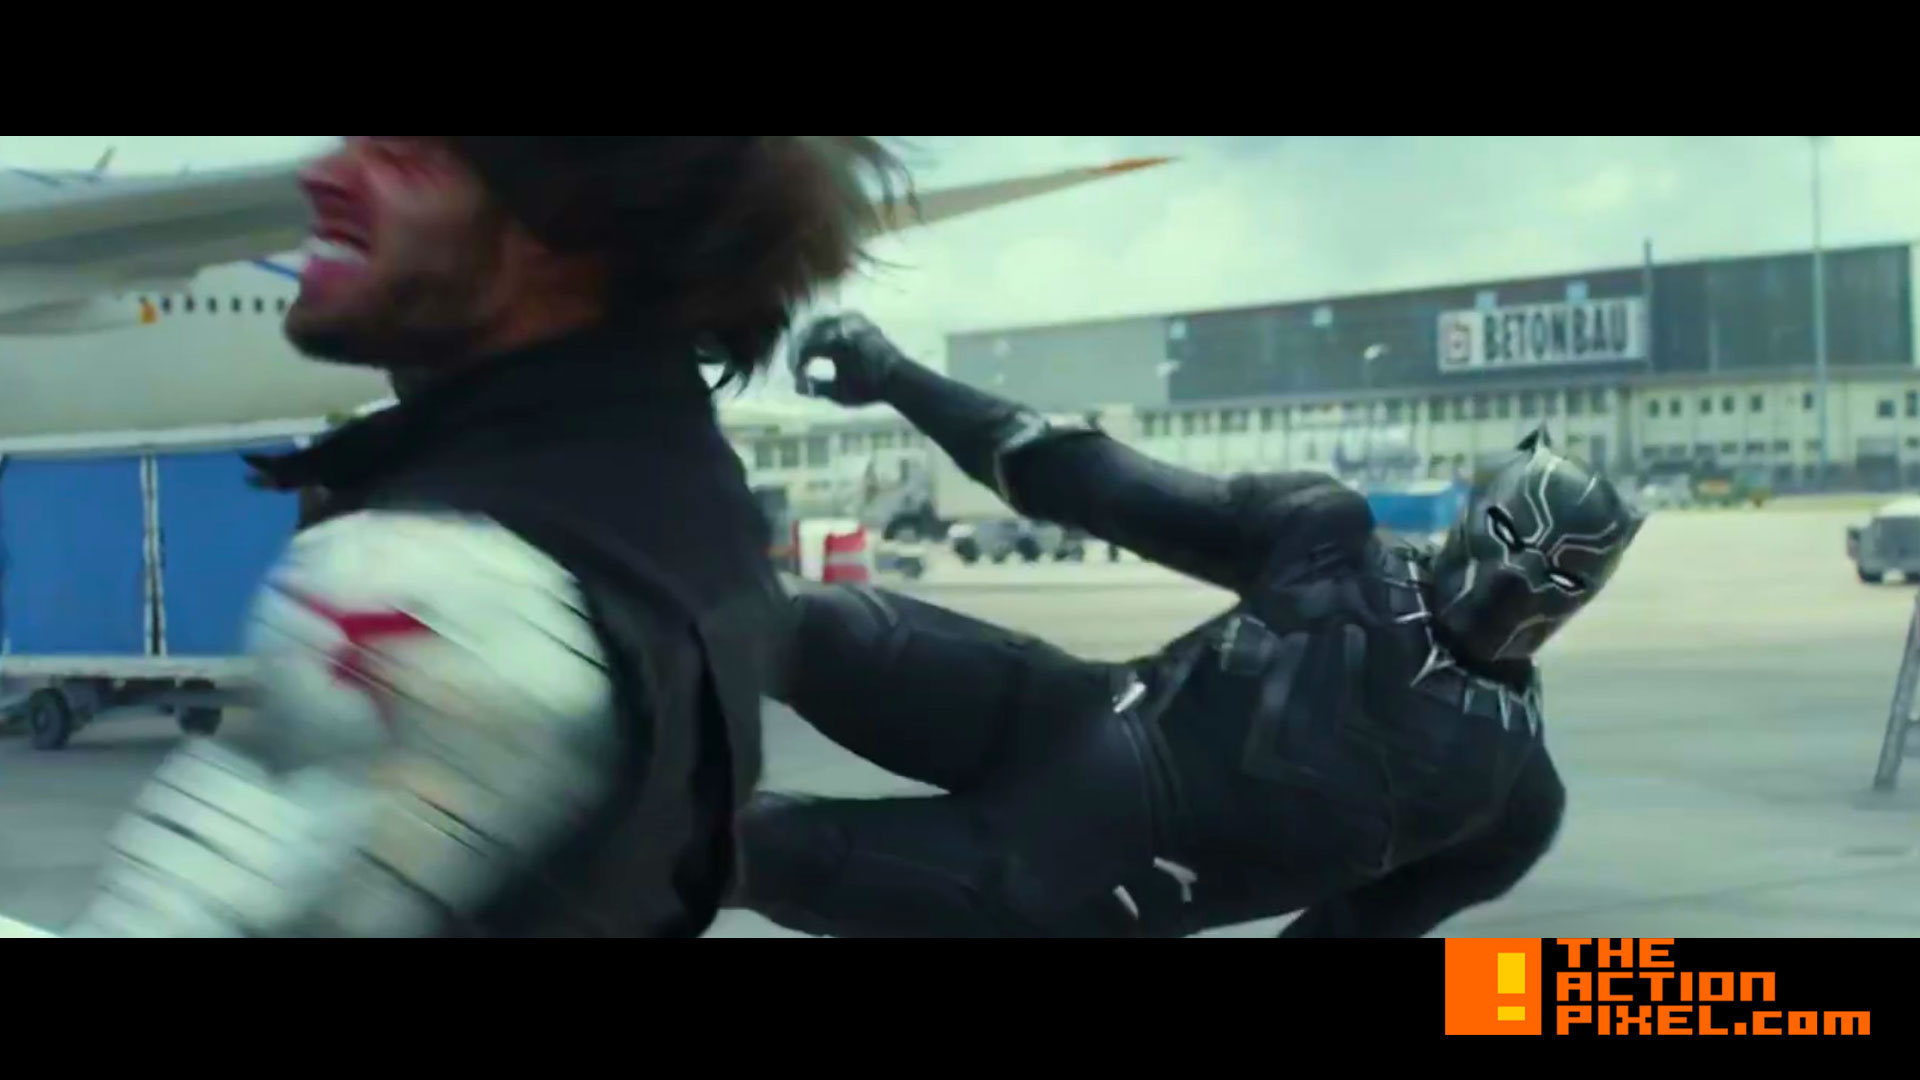 black panther _civilwar. captain america: civil war. shield. captain america. entertainment on tap. @theactionpixel